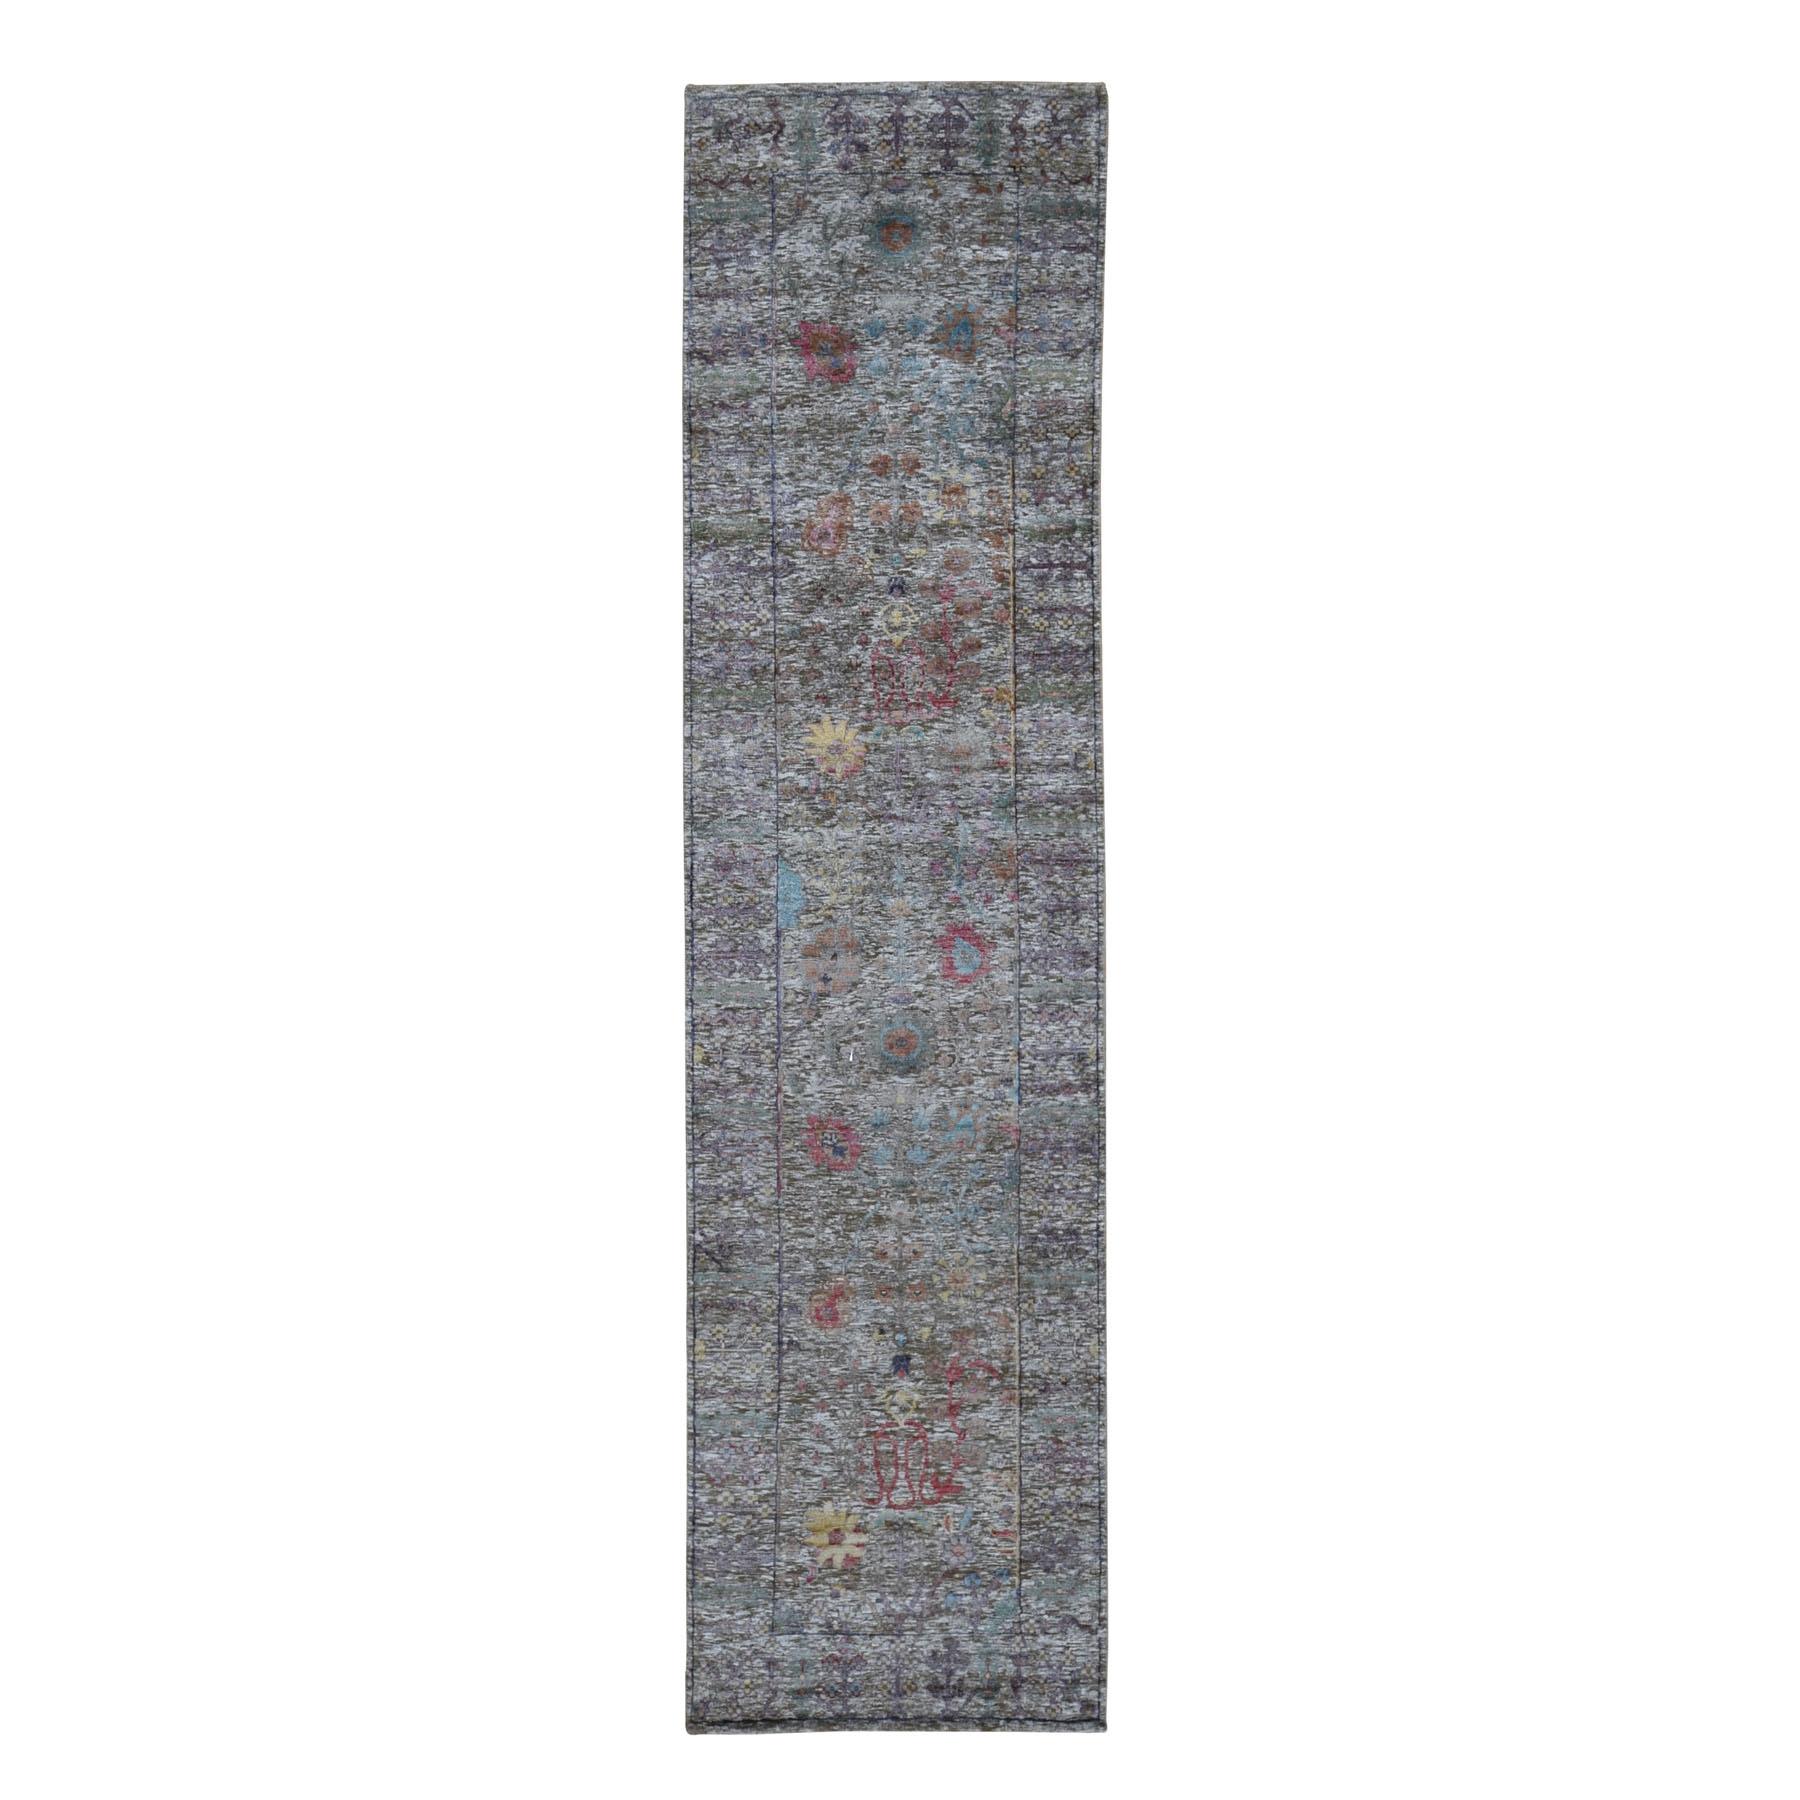 "2'6""x10' Honey Brown Silk With Textured Wool Vaze Design Runner Hand Knotted Oriental Rug 49474"